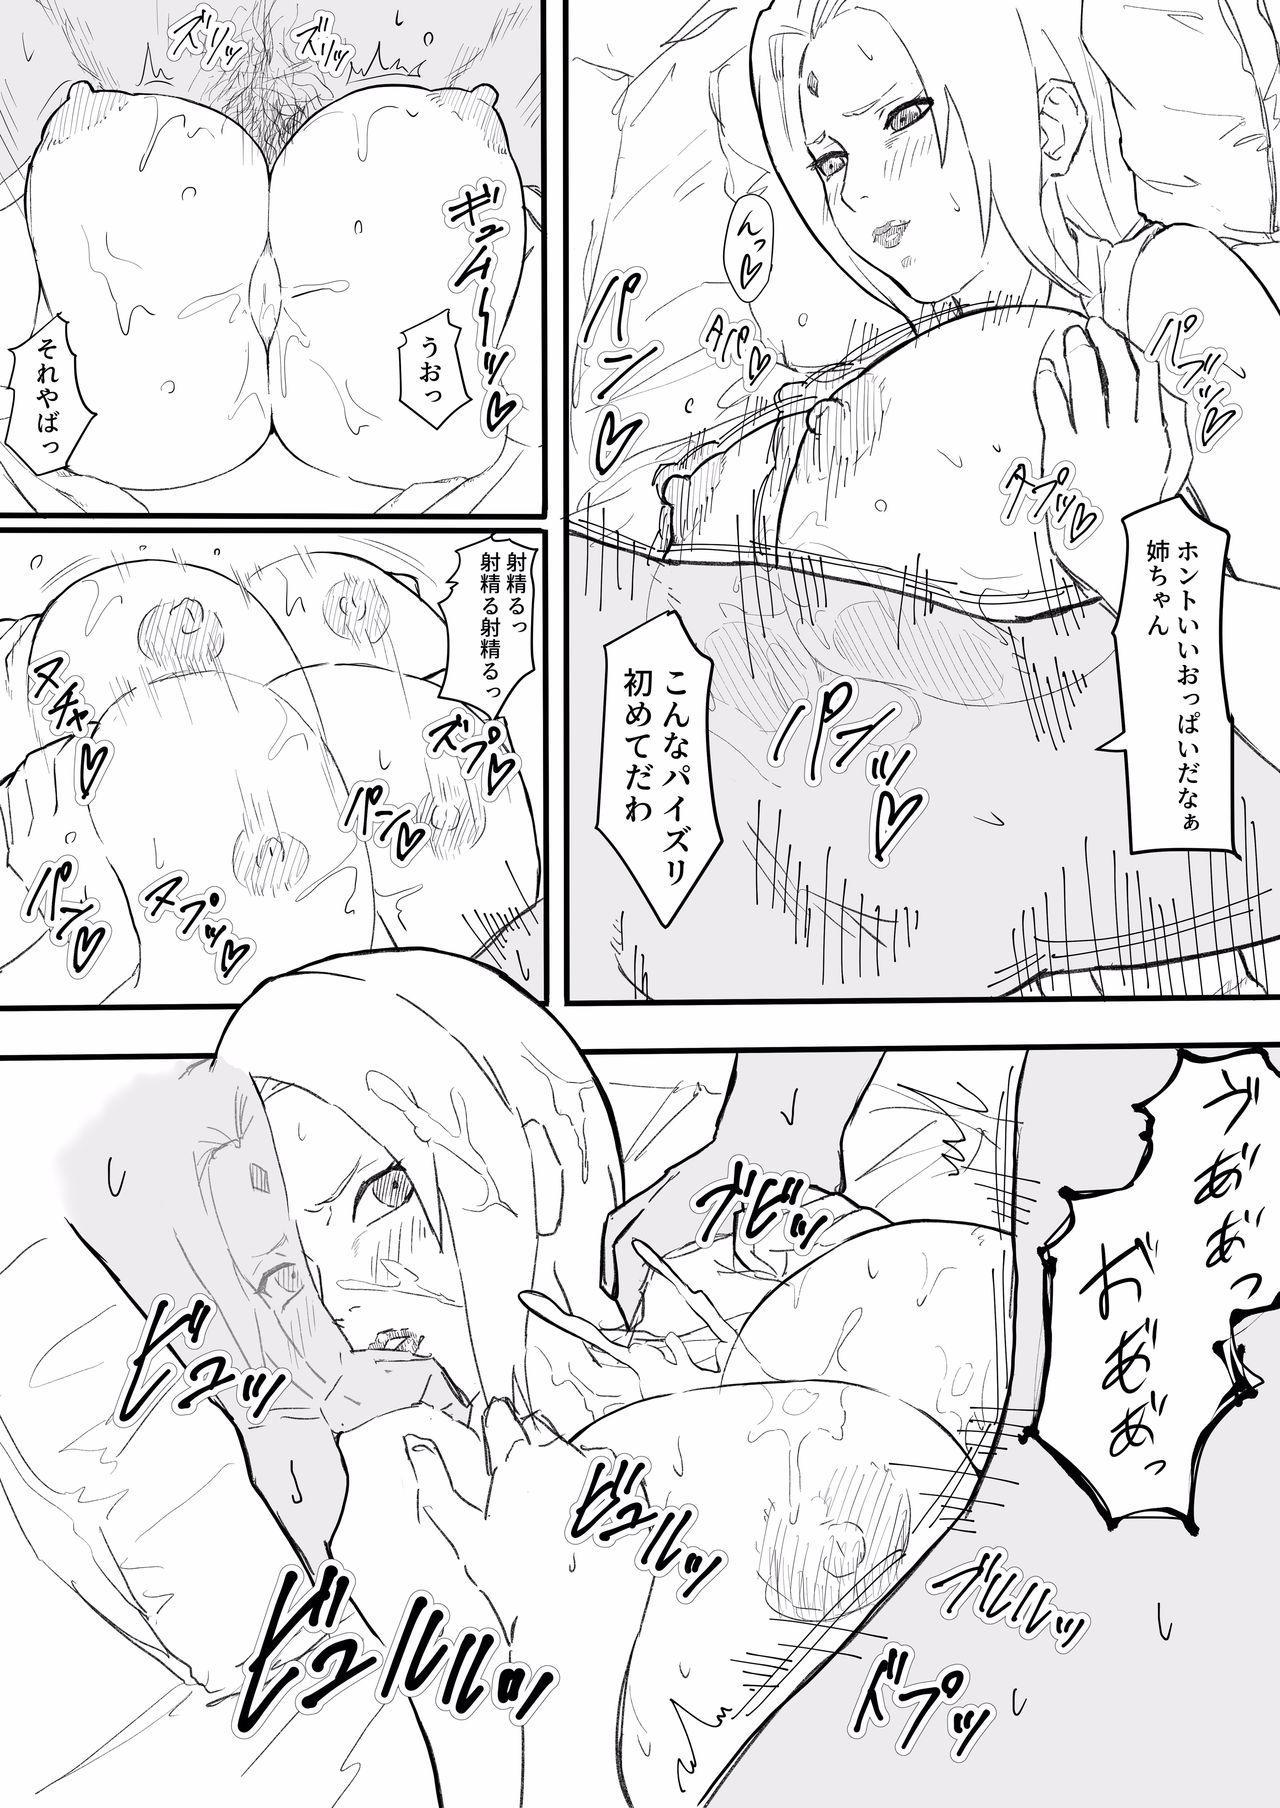 [Iwao] Te Ero Manga (Naruto) Updated 11